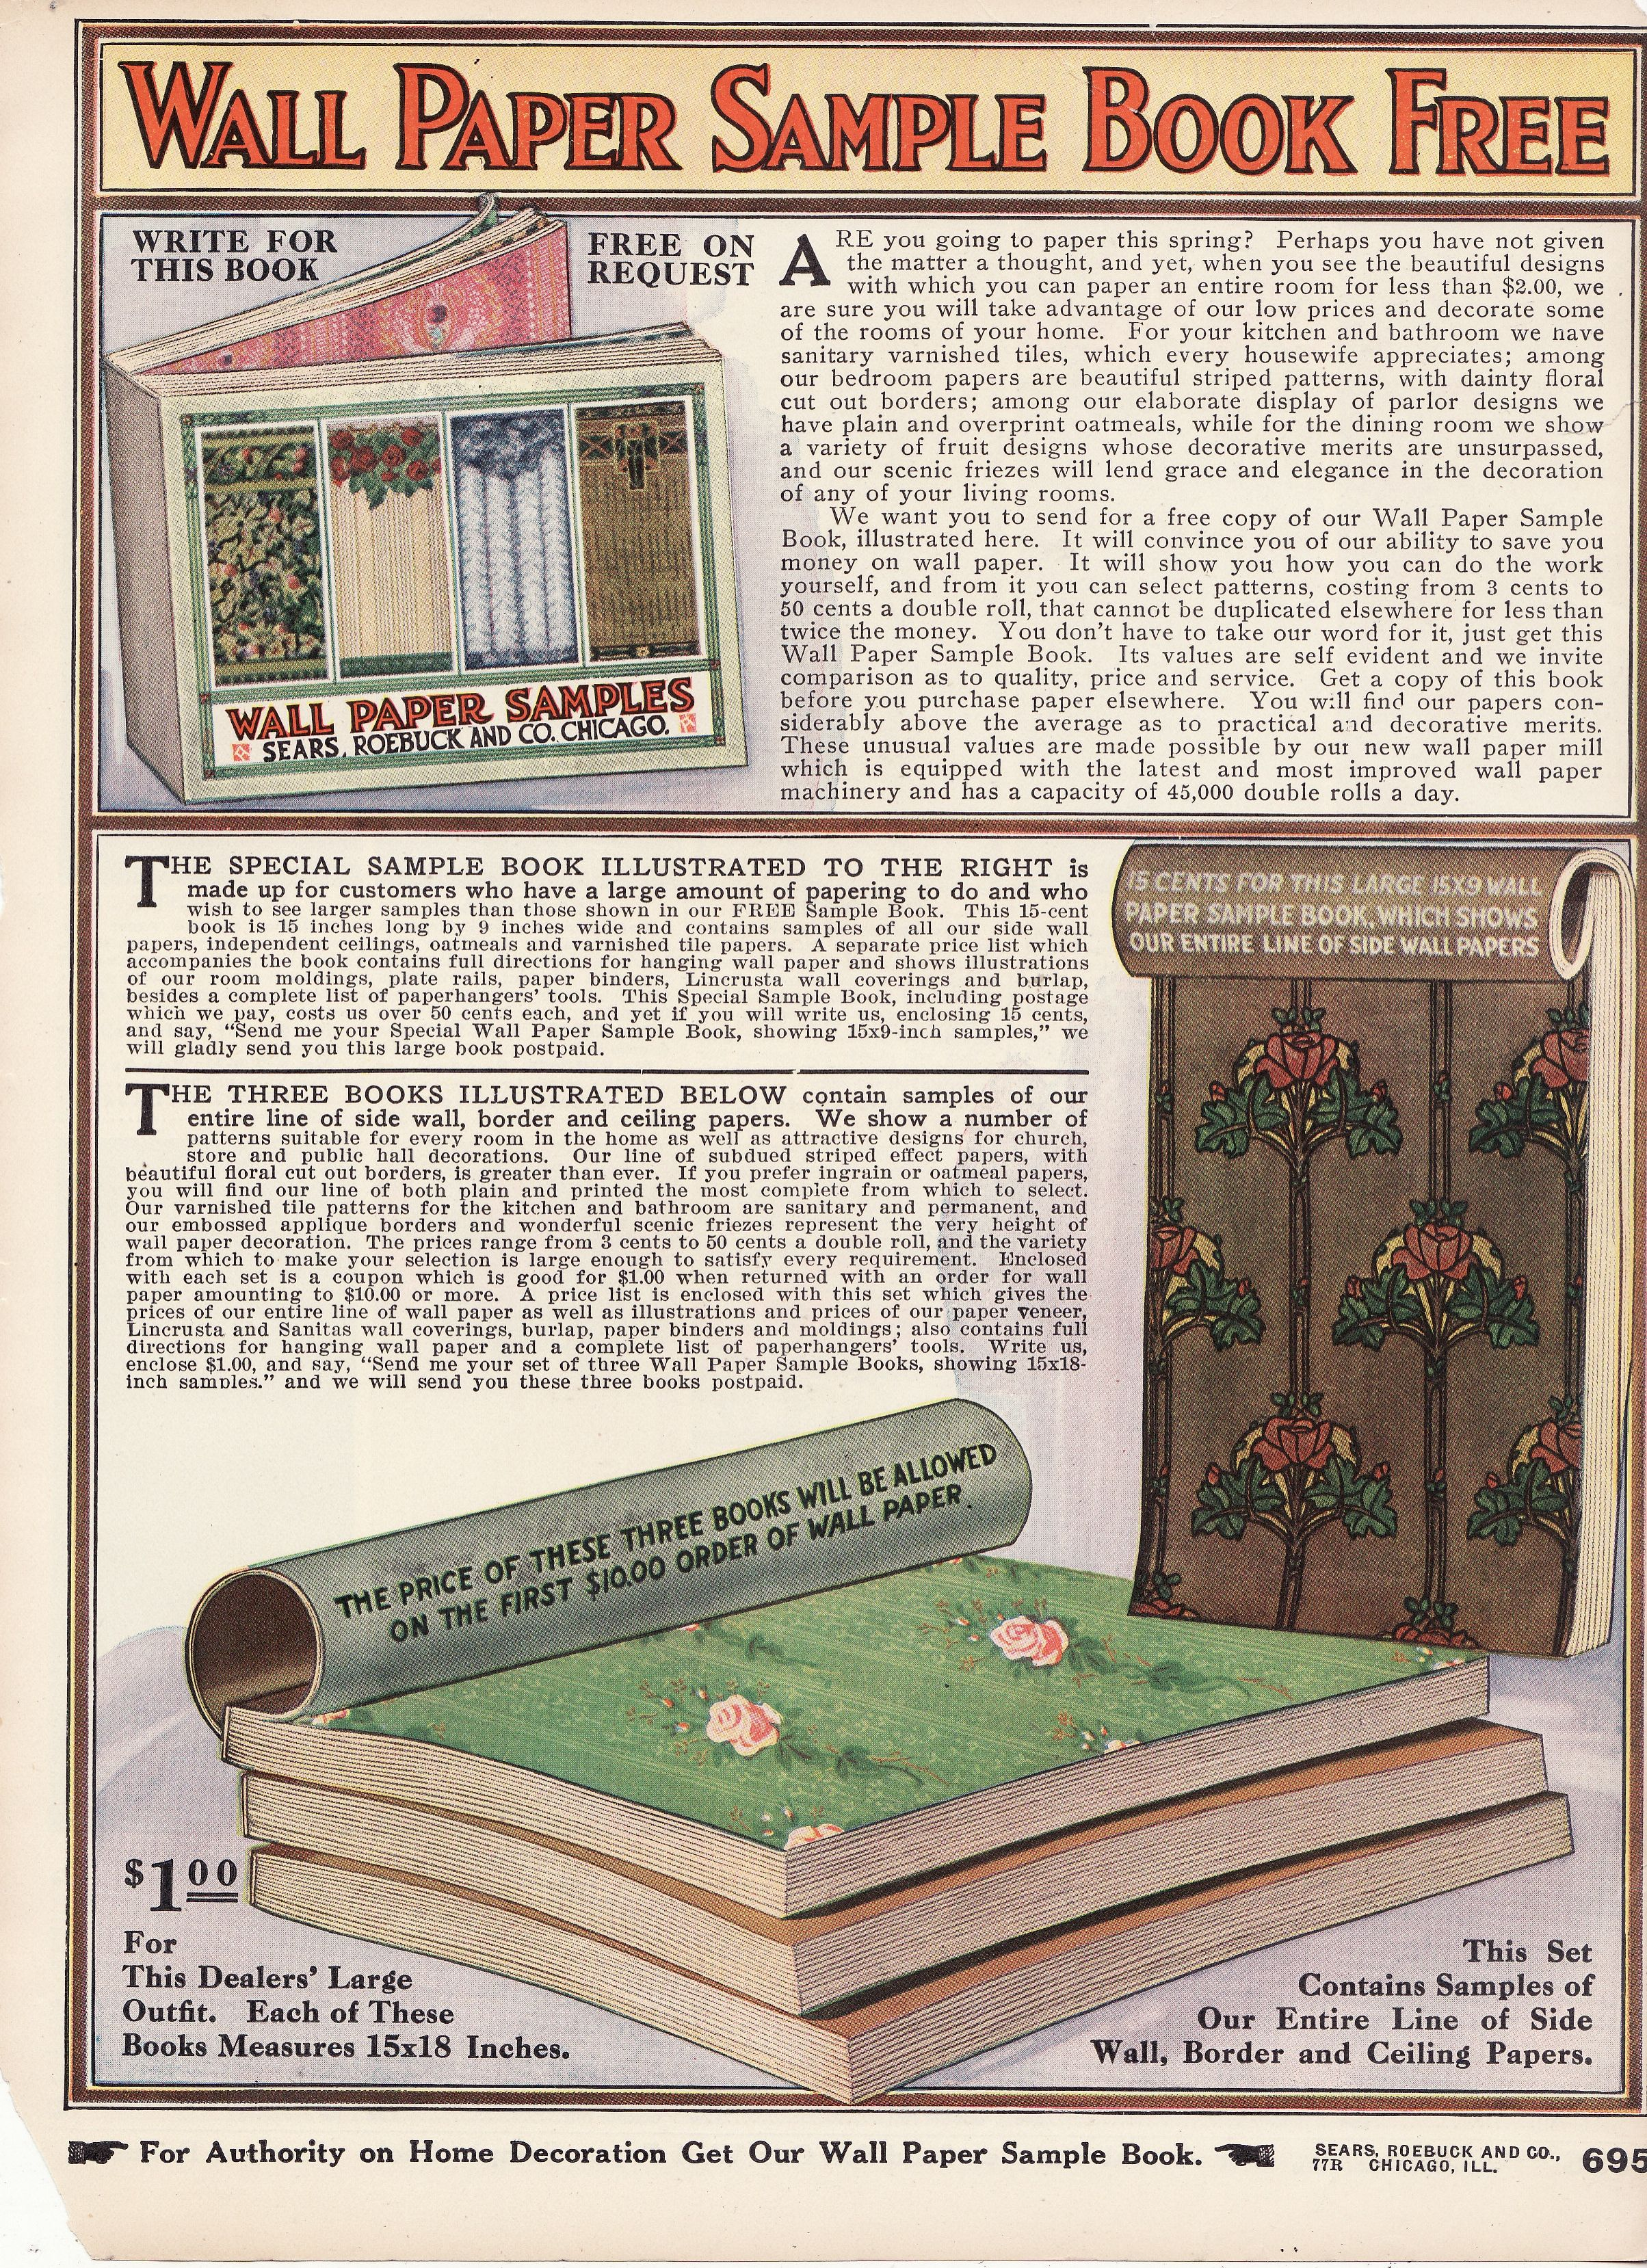 Wallpaper Sample Book Ad | 1914 SEARS Spring/Summer Catalog